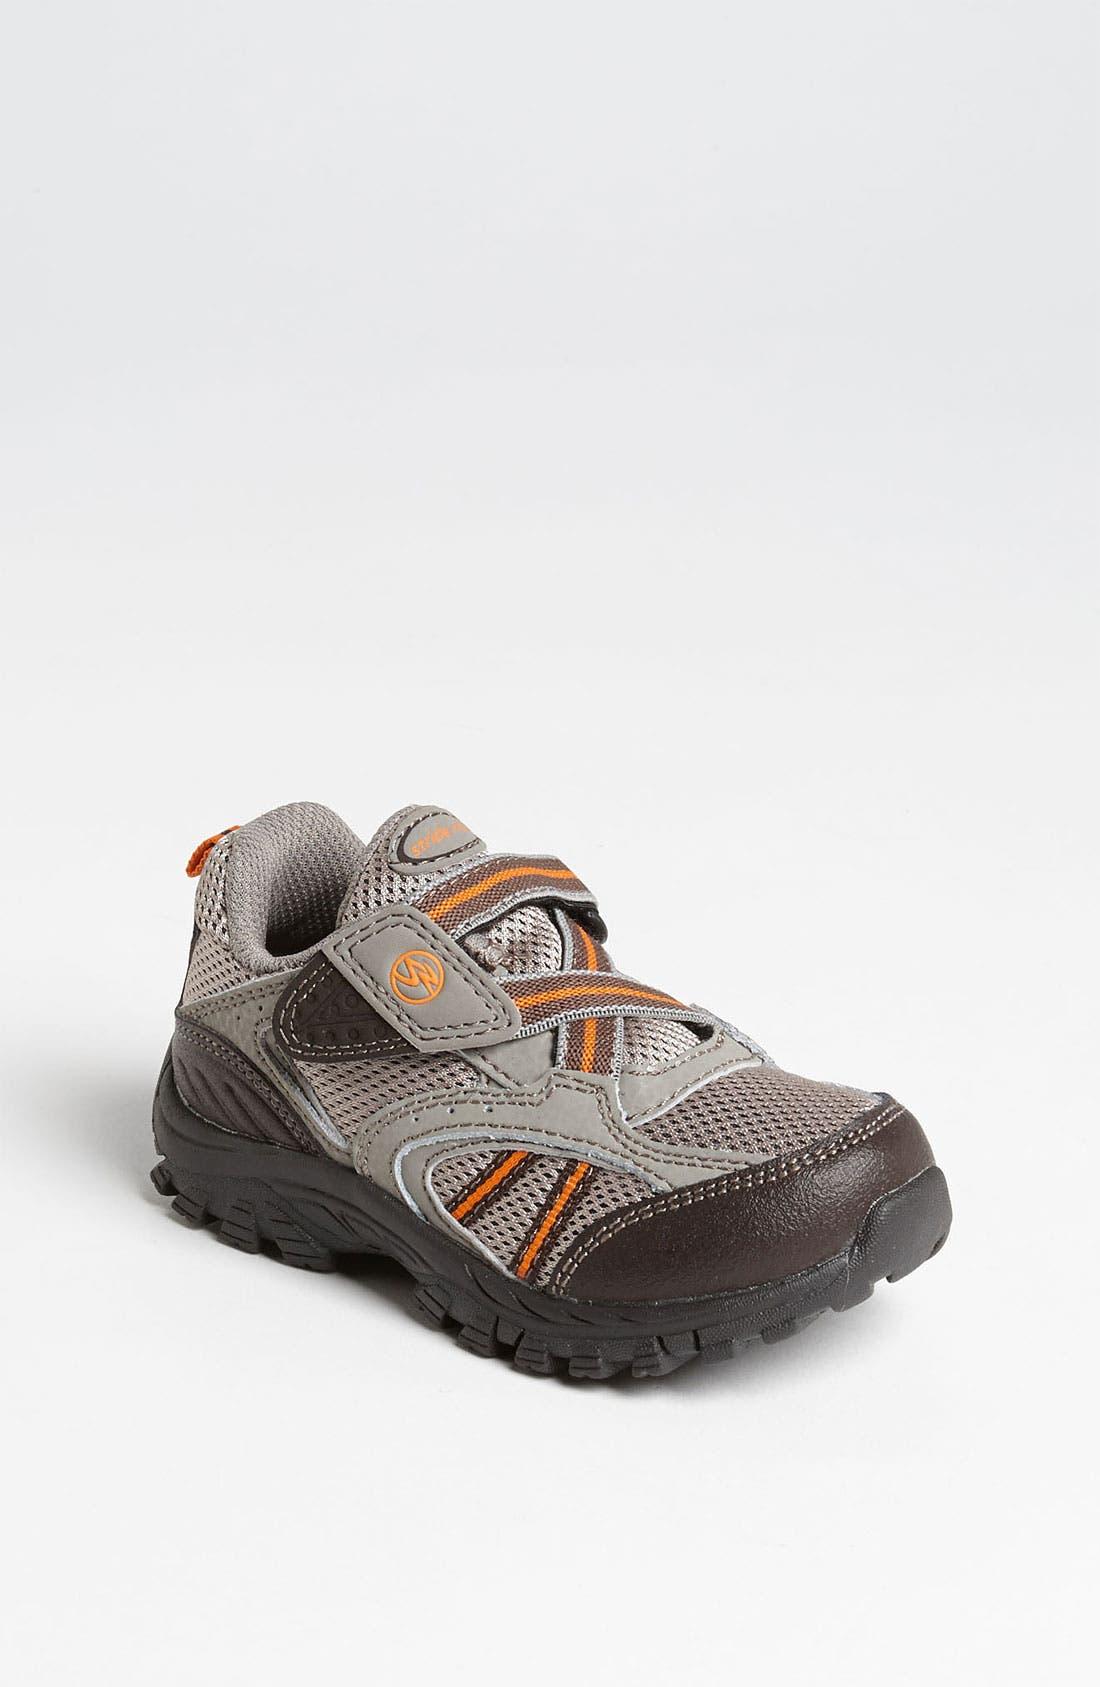 Alternate Image 1 Selected - Stride Rite 'Clayton' Sneaker (Toddler)